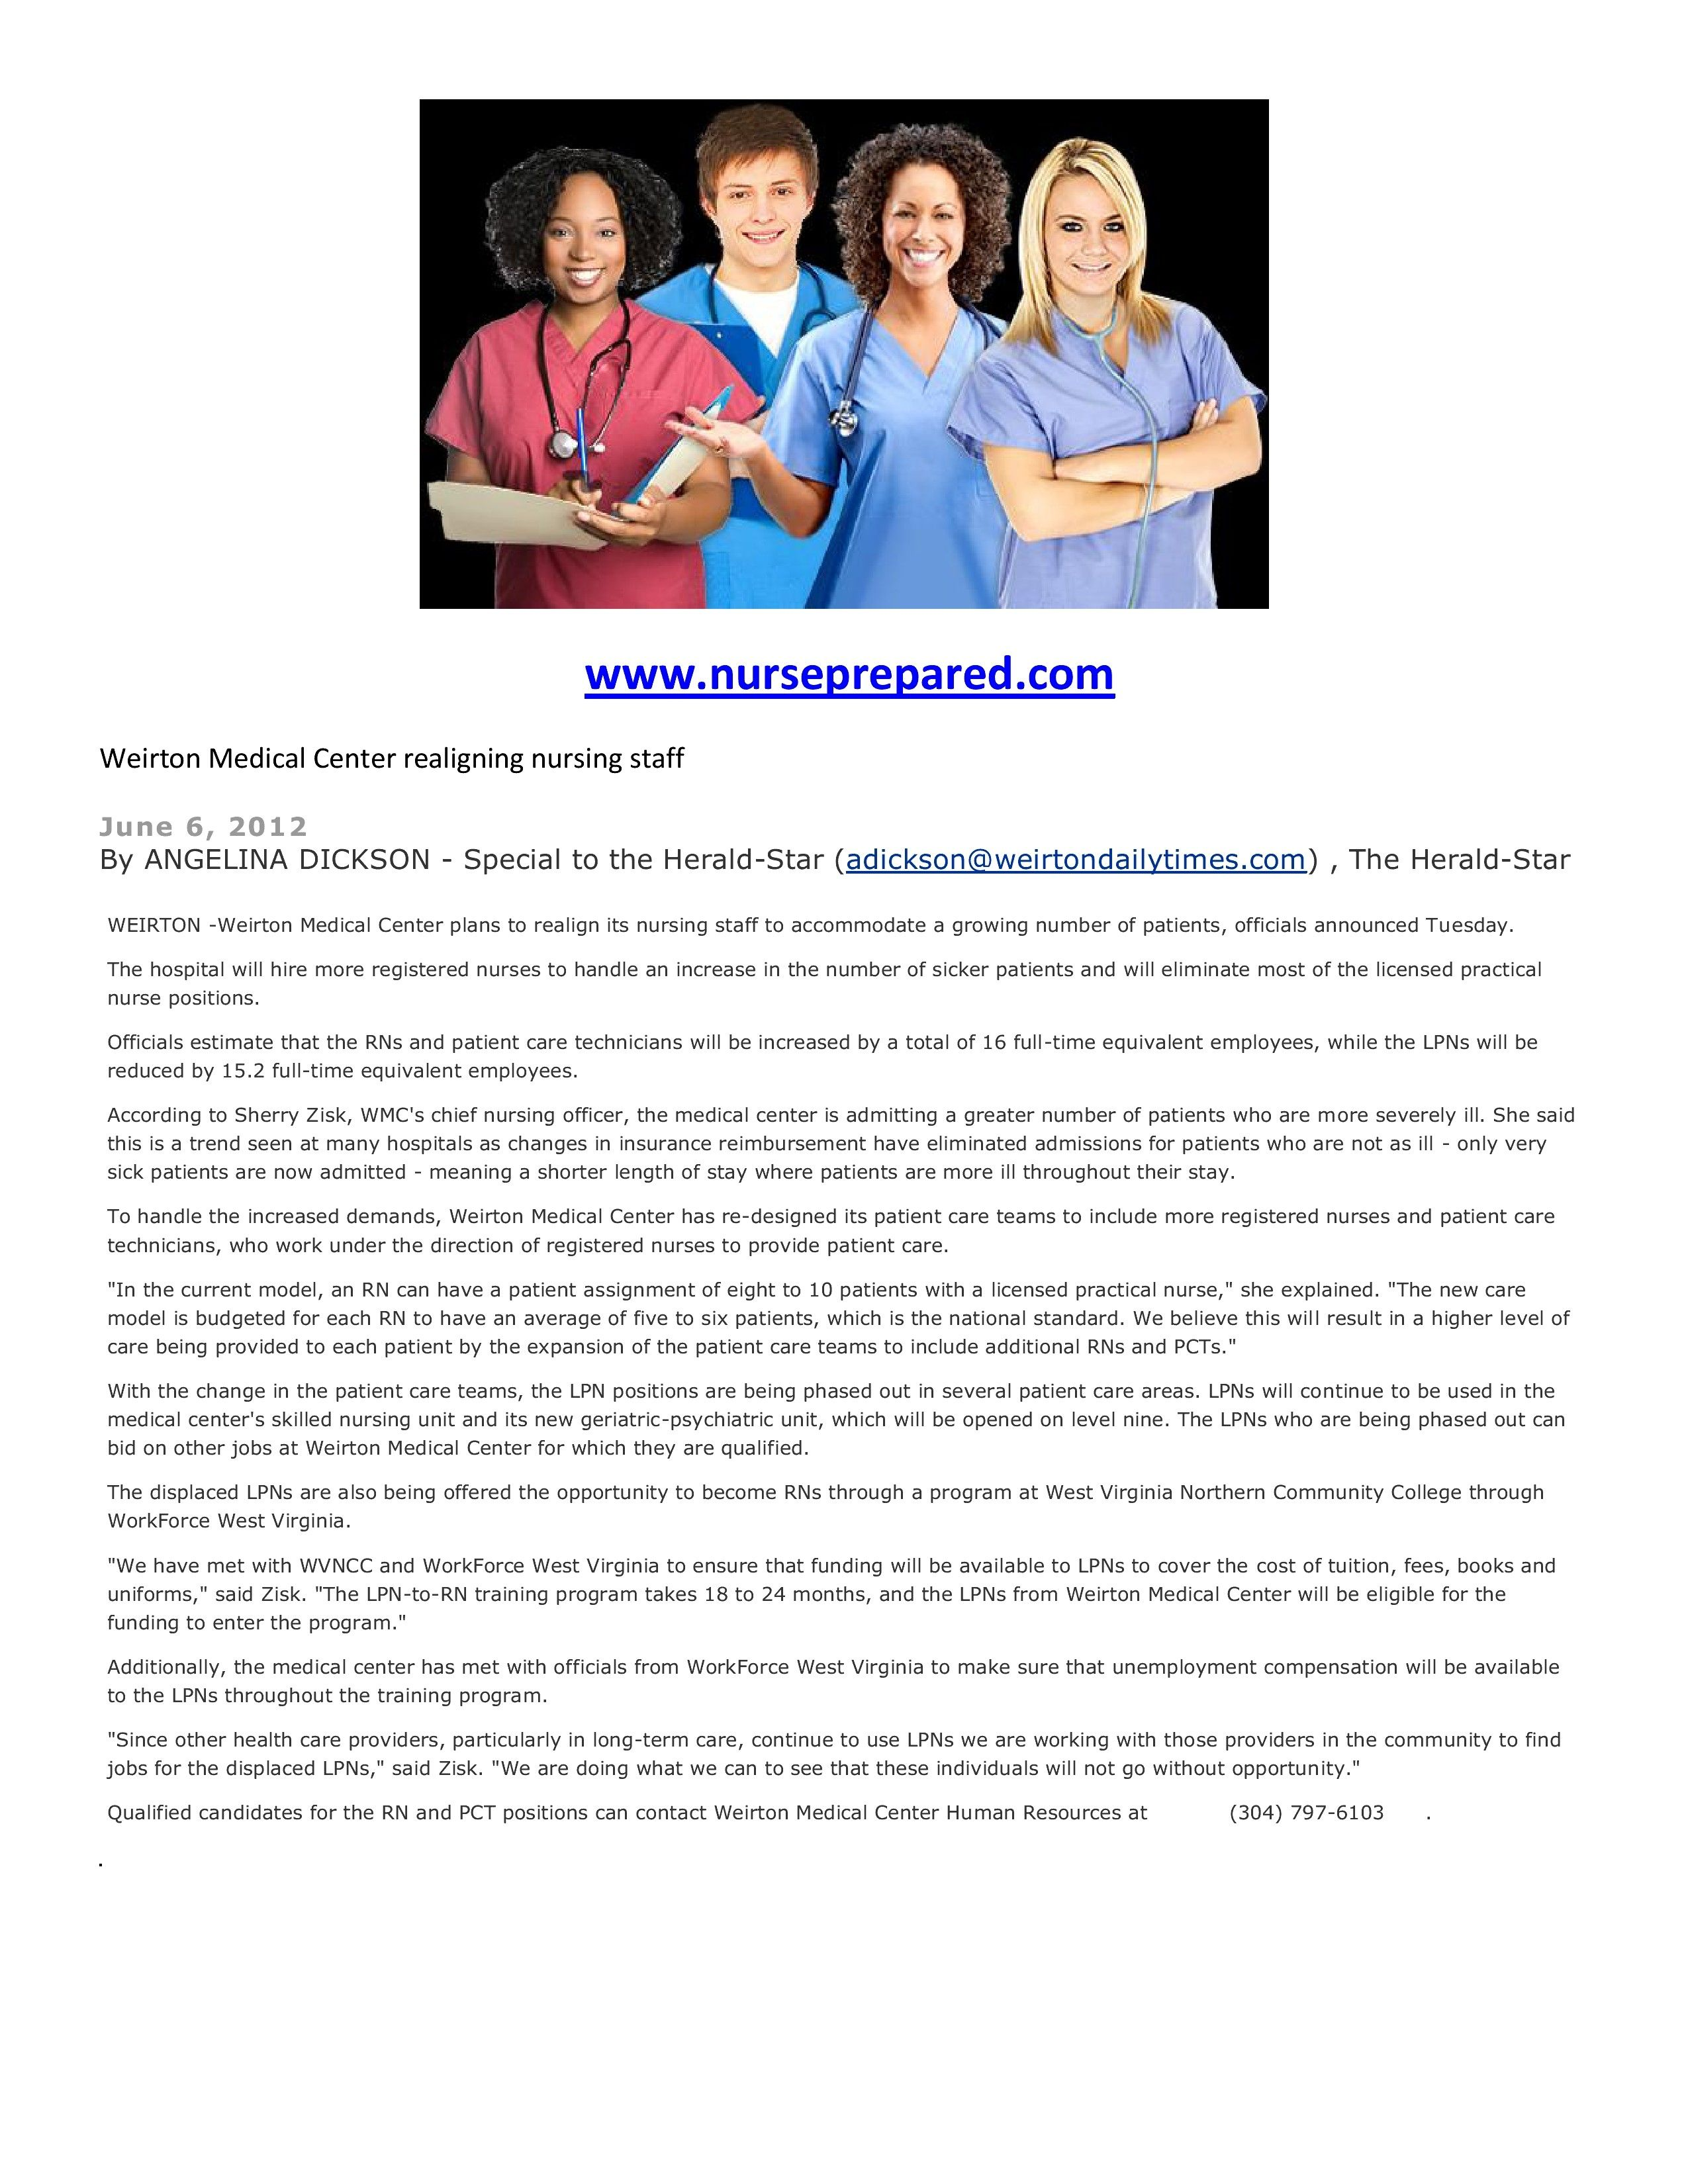 Nursing Staff Nursing Students College Nursing Travel Nursing